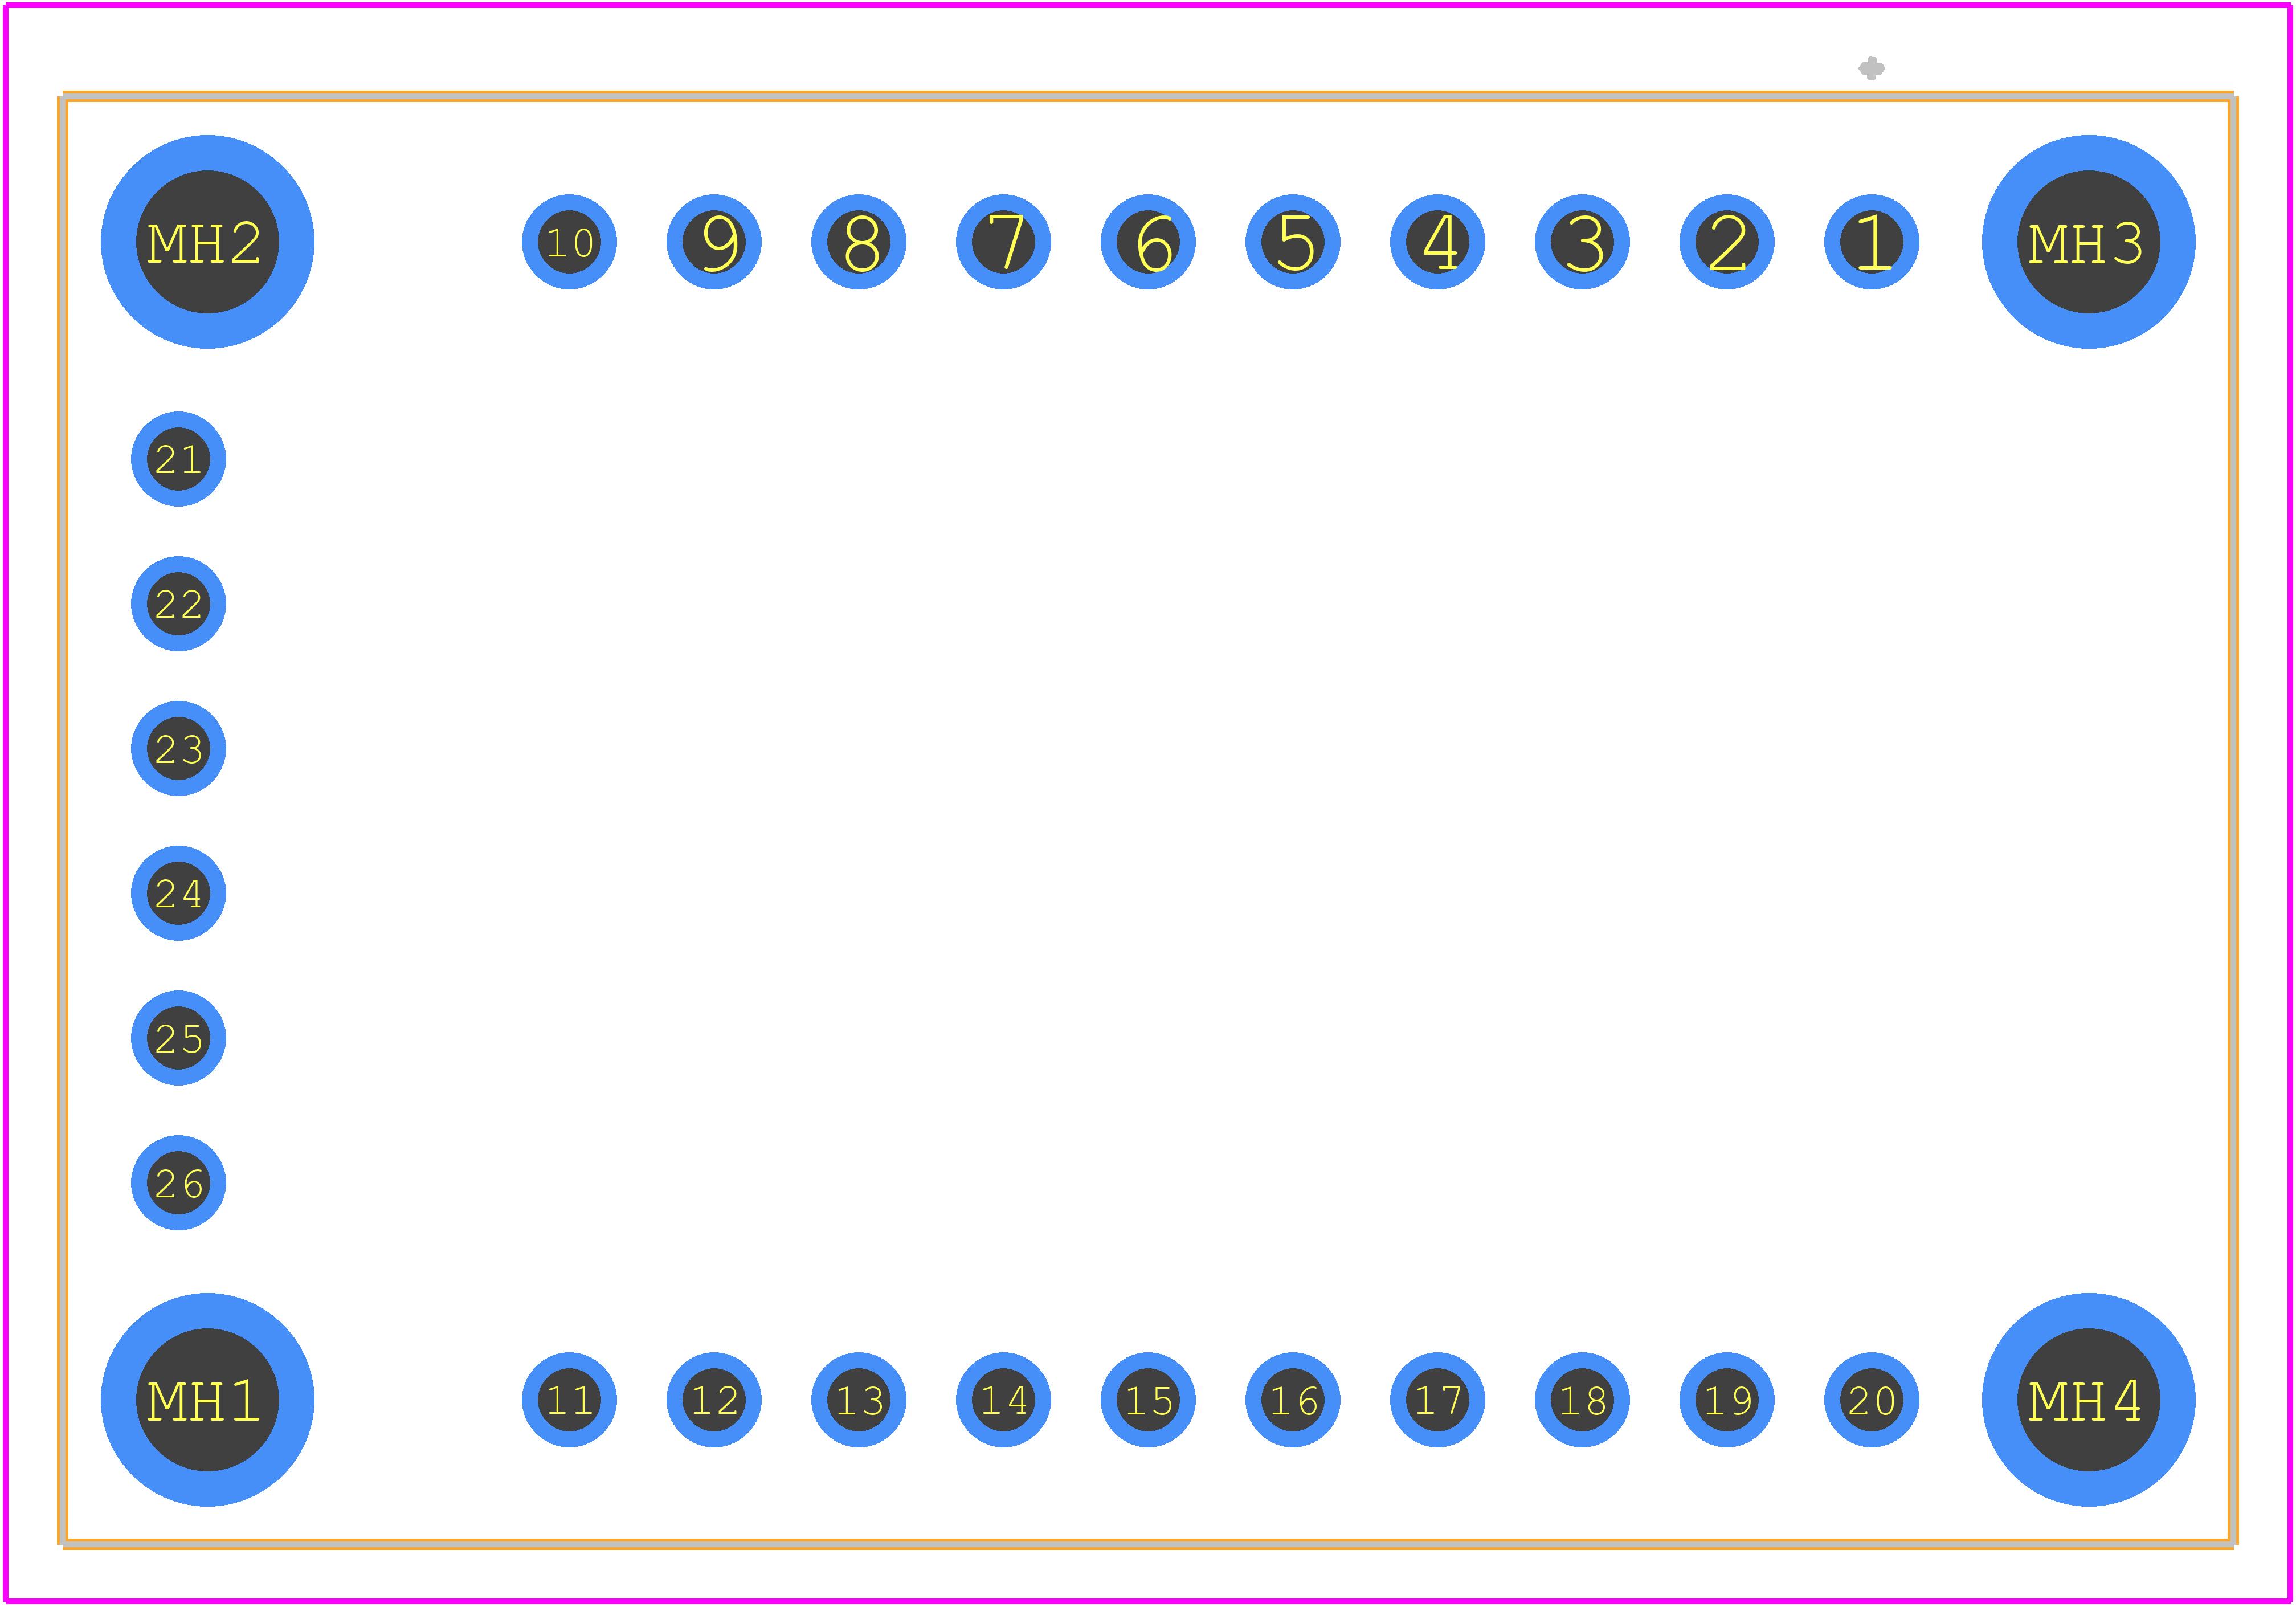 2471 - Adafruit PCB footprint - Other - 2471